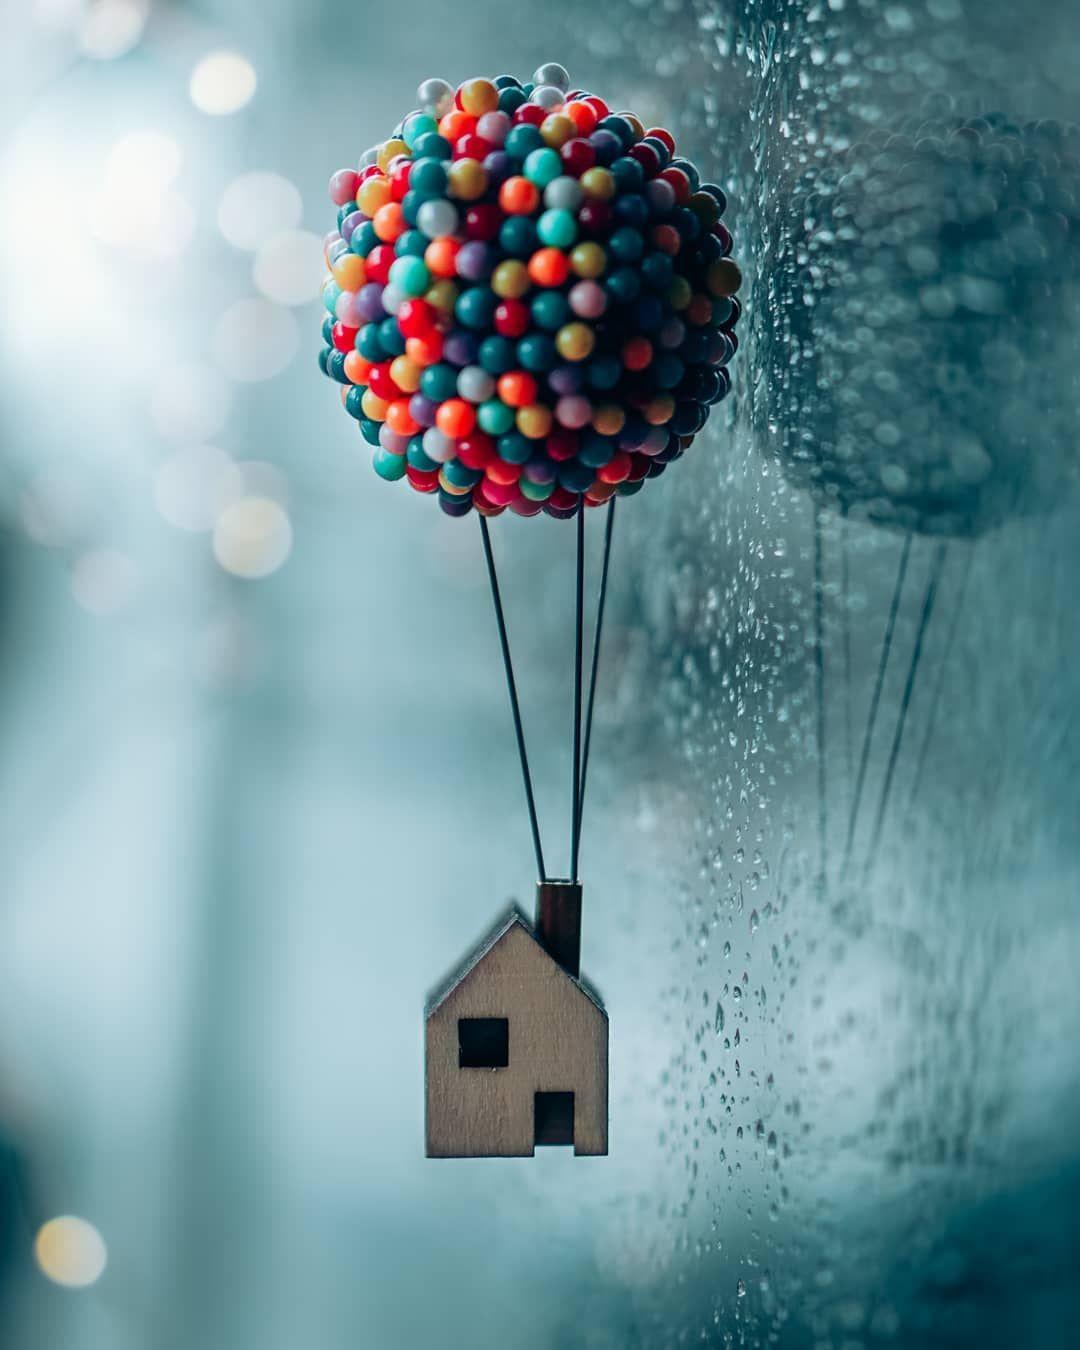 Bliss Dollhouse Wallpaper: Pin Van Vesna Vasiljević Op Beautiful... In 2019